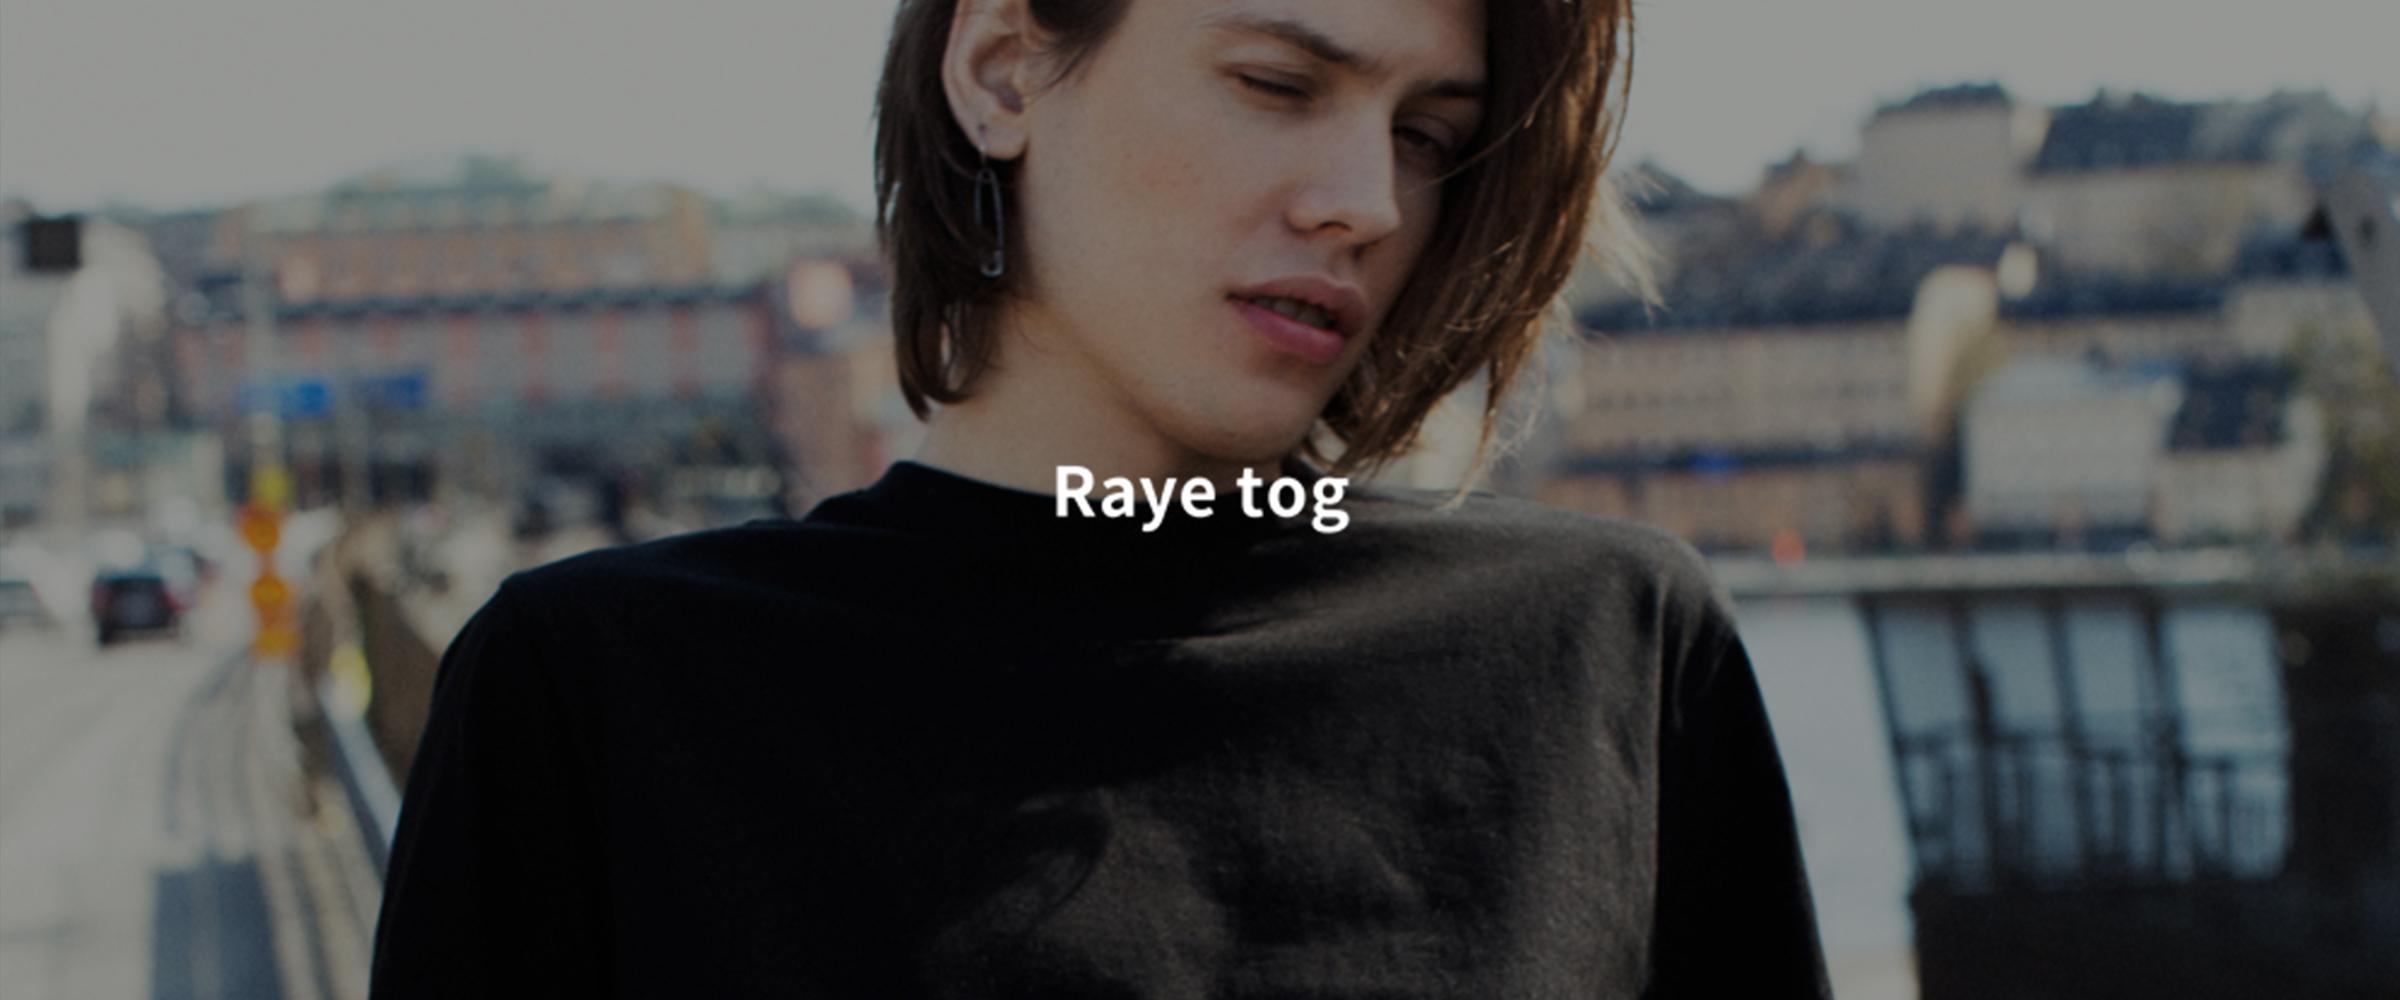 ray tog.jpg